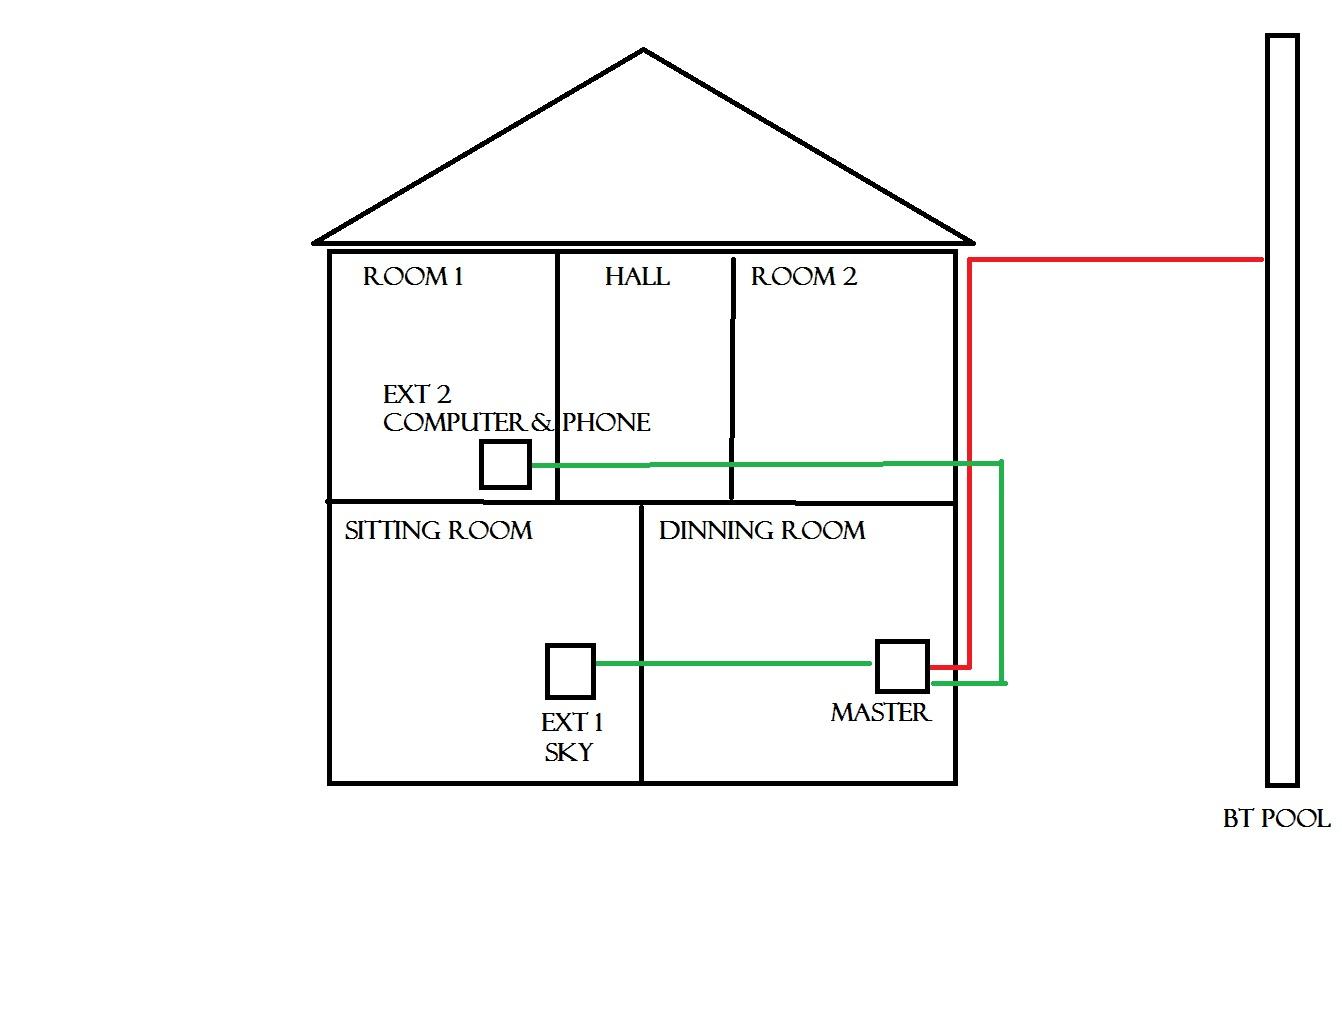 medium resolution of bt infinity 2 wiring diagram wiring librarybt infinity 2 wiring diagram